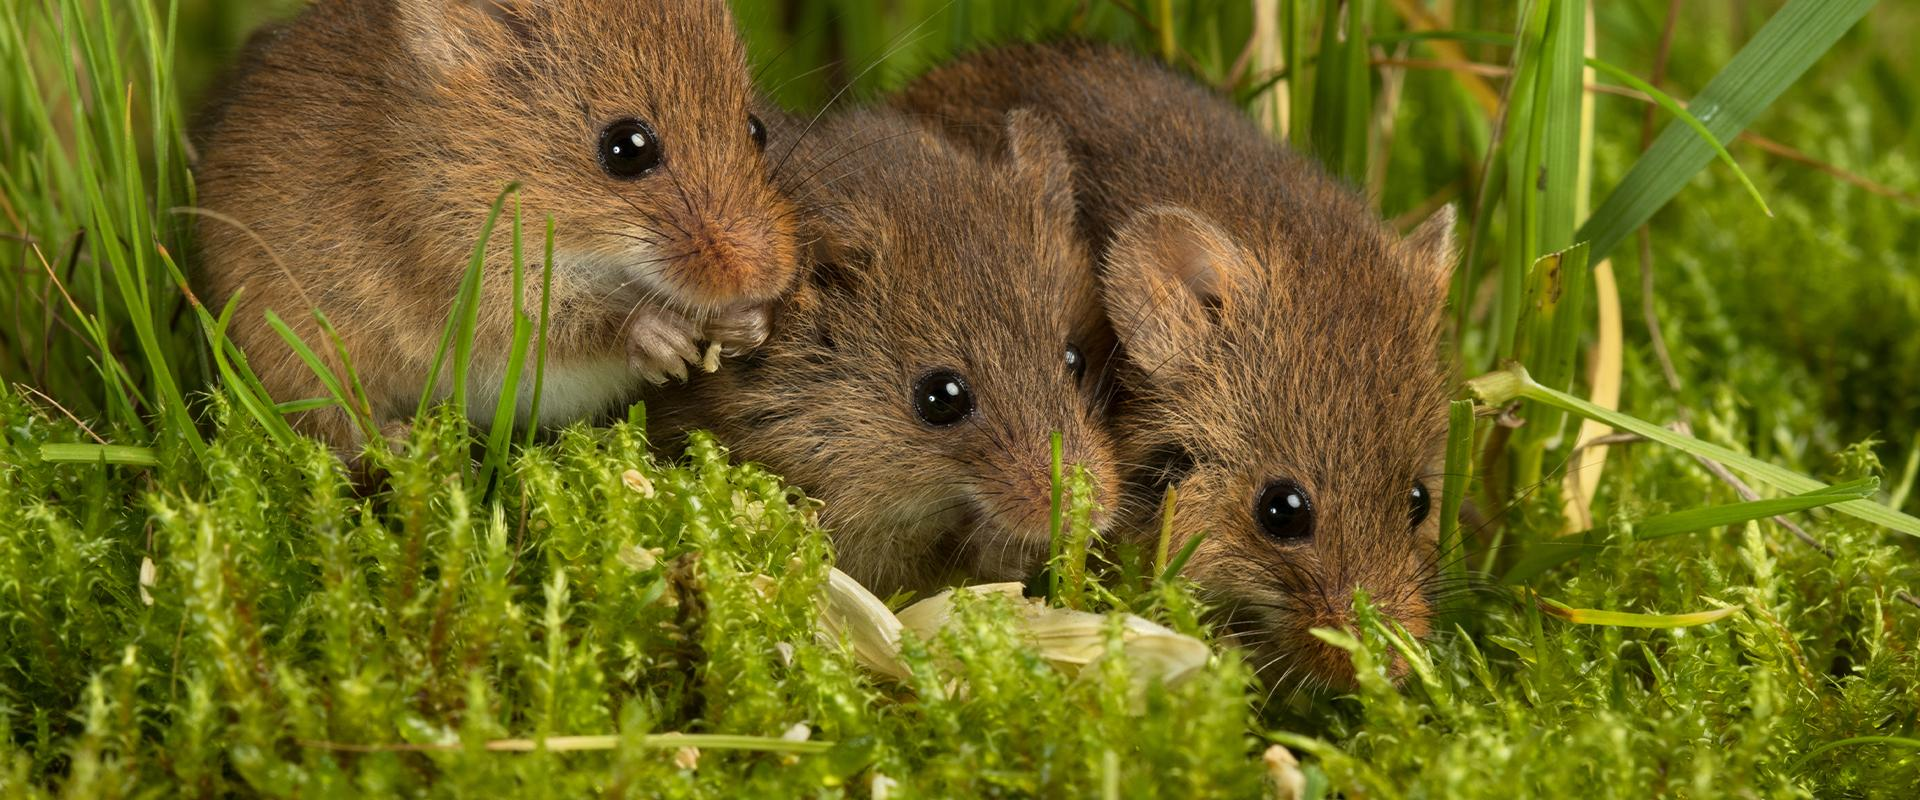 three mice in the grass